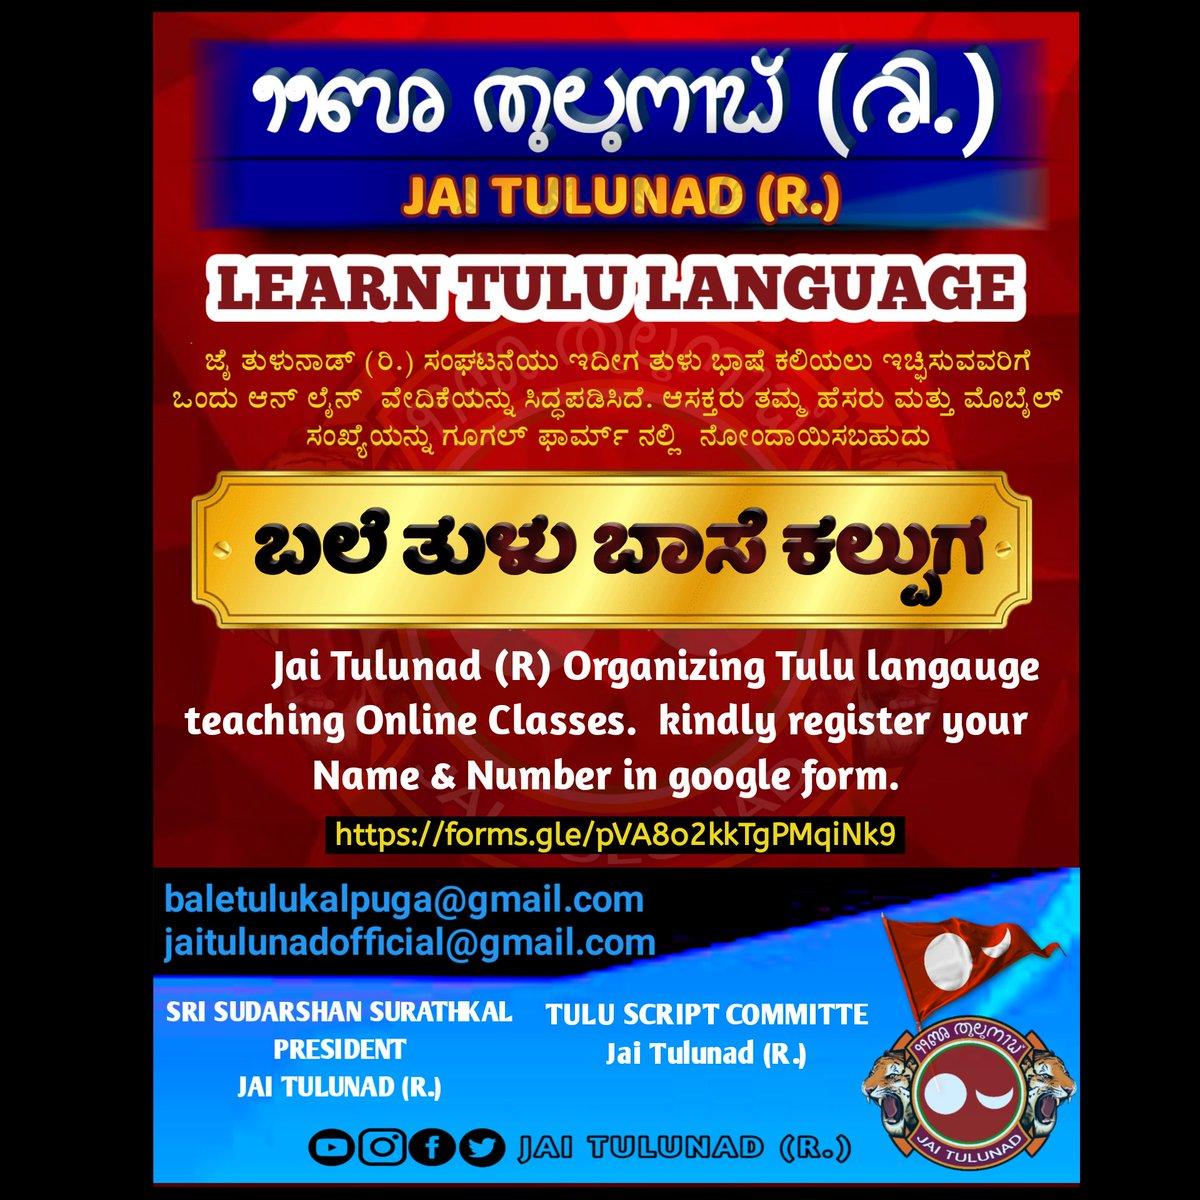 LEARN TULU LANGUAGE (Bale Tulu Bāse Kalpuga)  Registration Form: https://t.co/Qed8ToUUev https://t.co/1IVwASA1fk